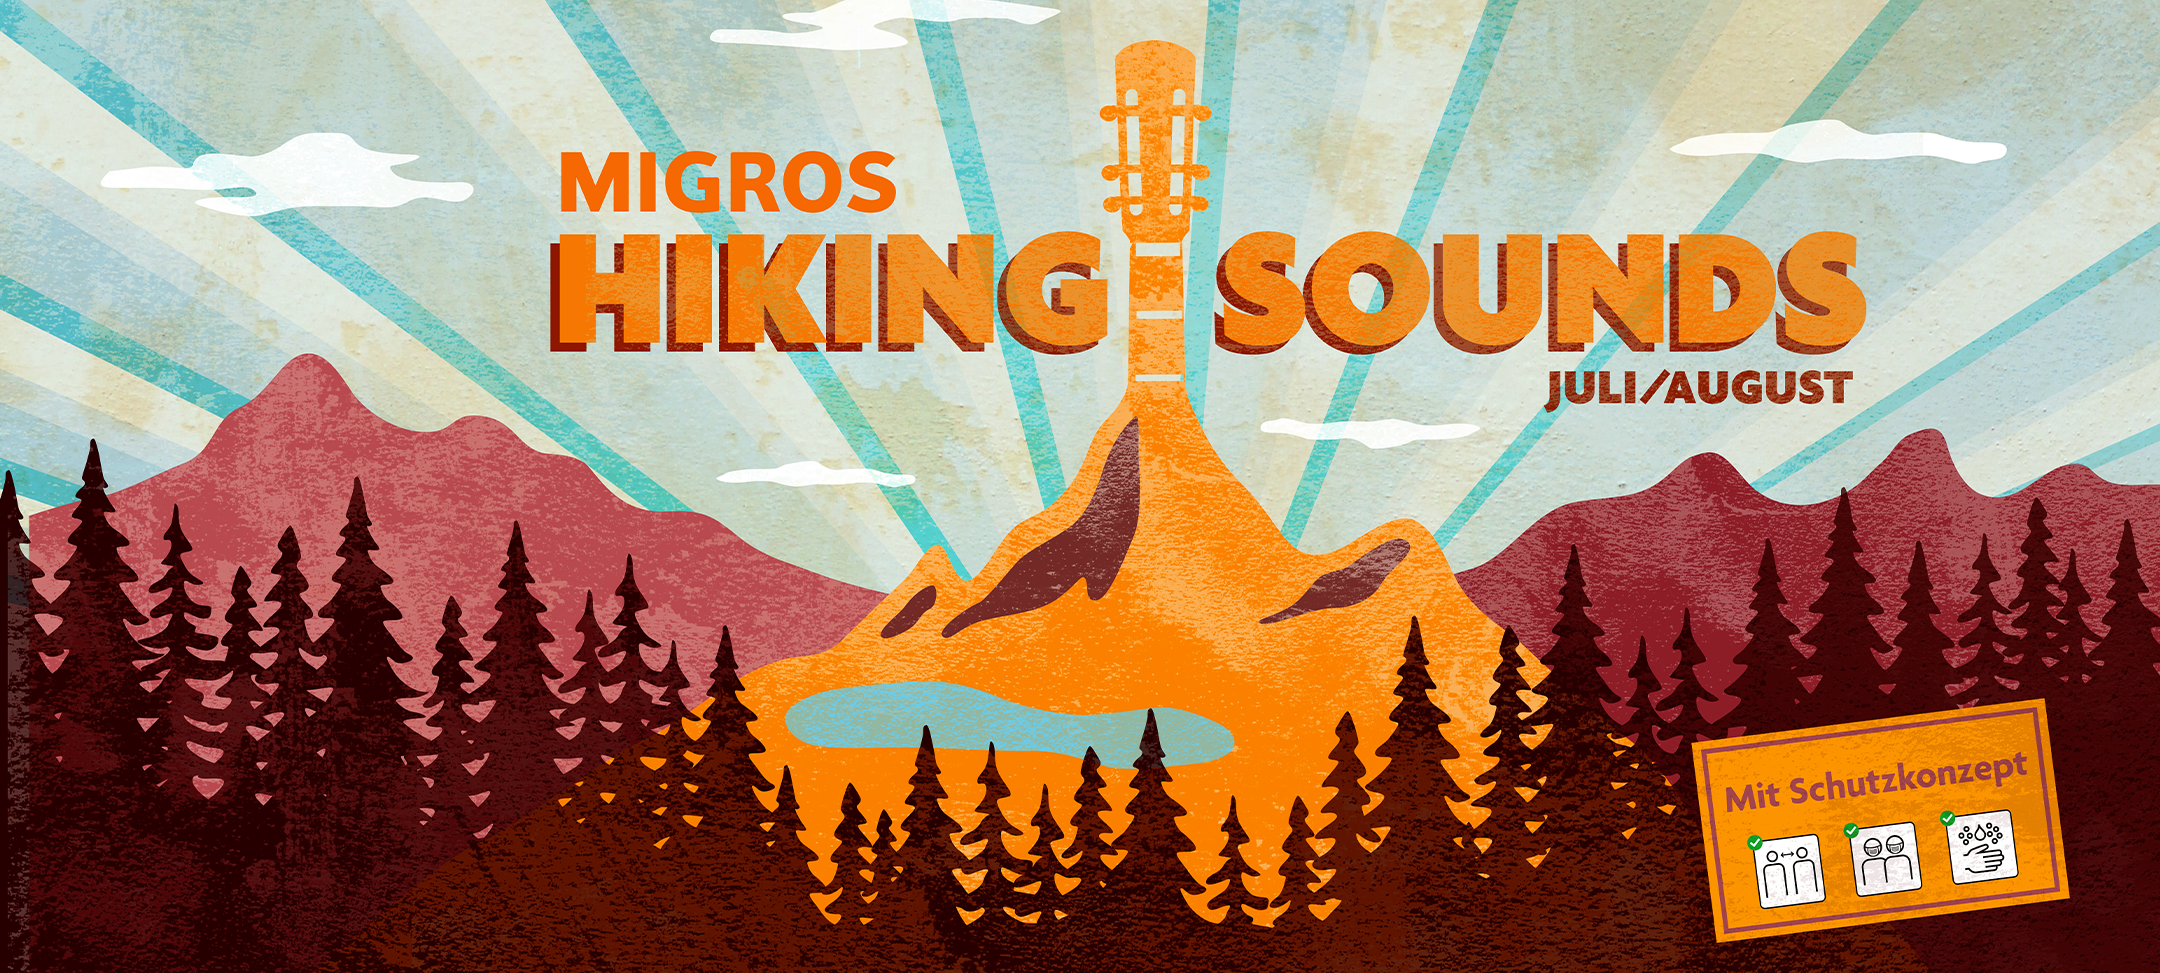 Migroshiking Sounds